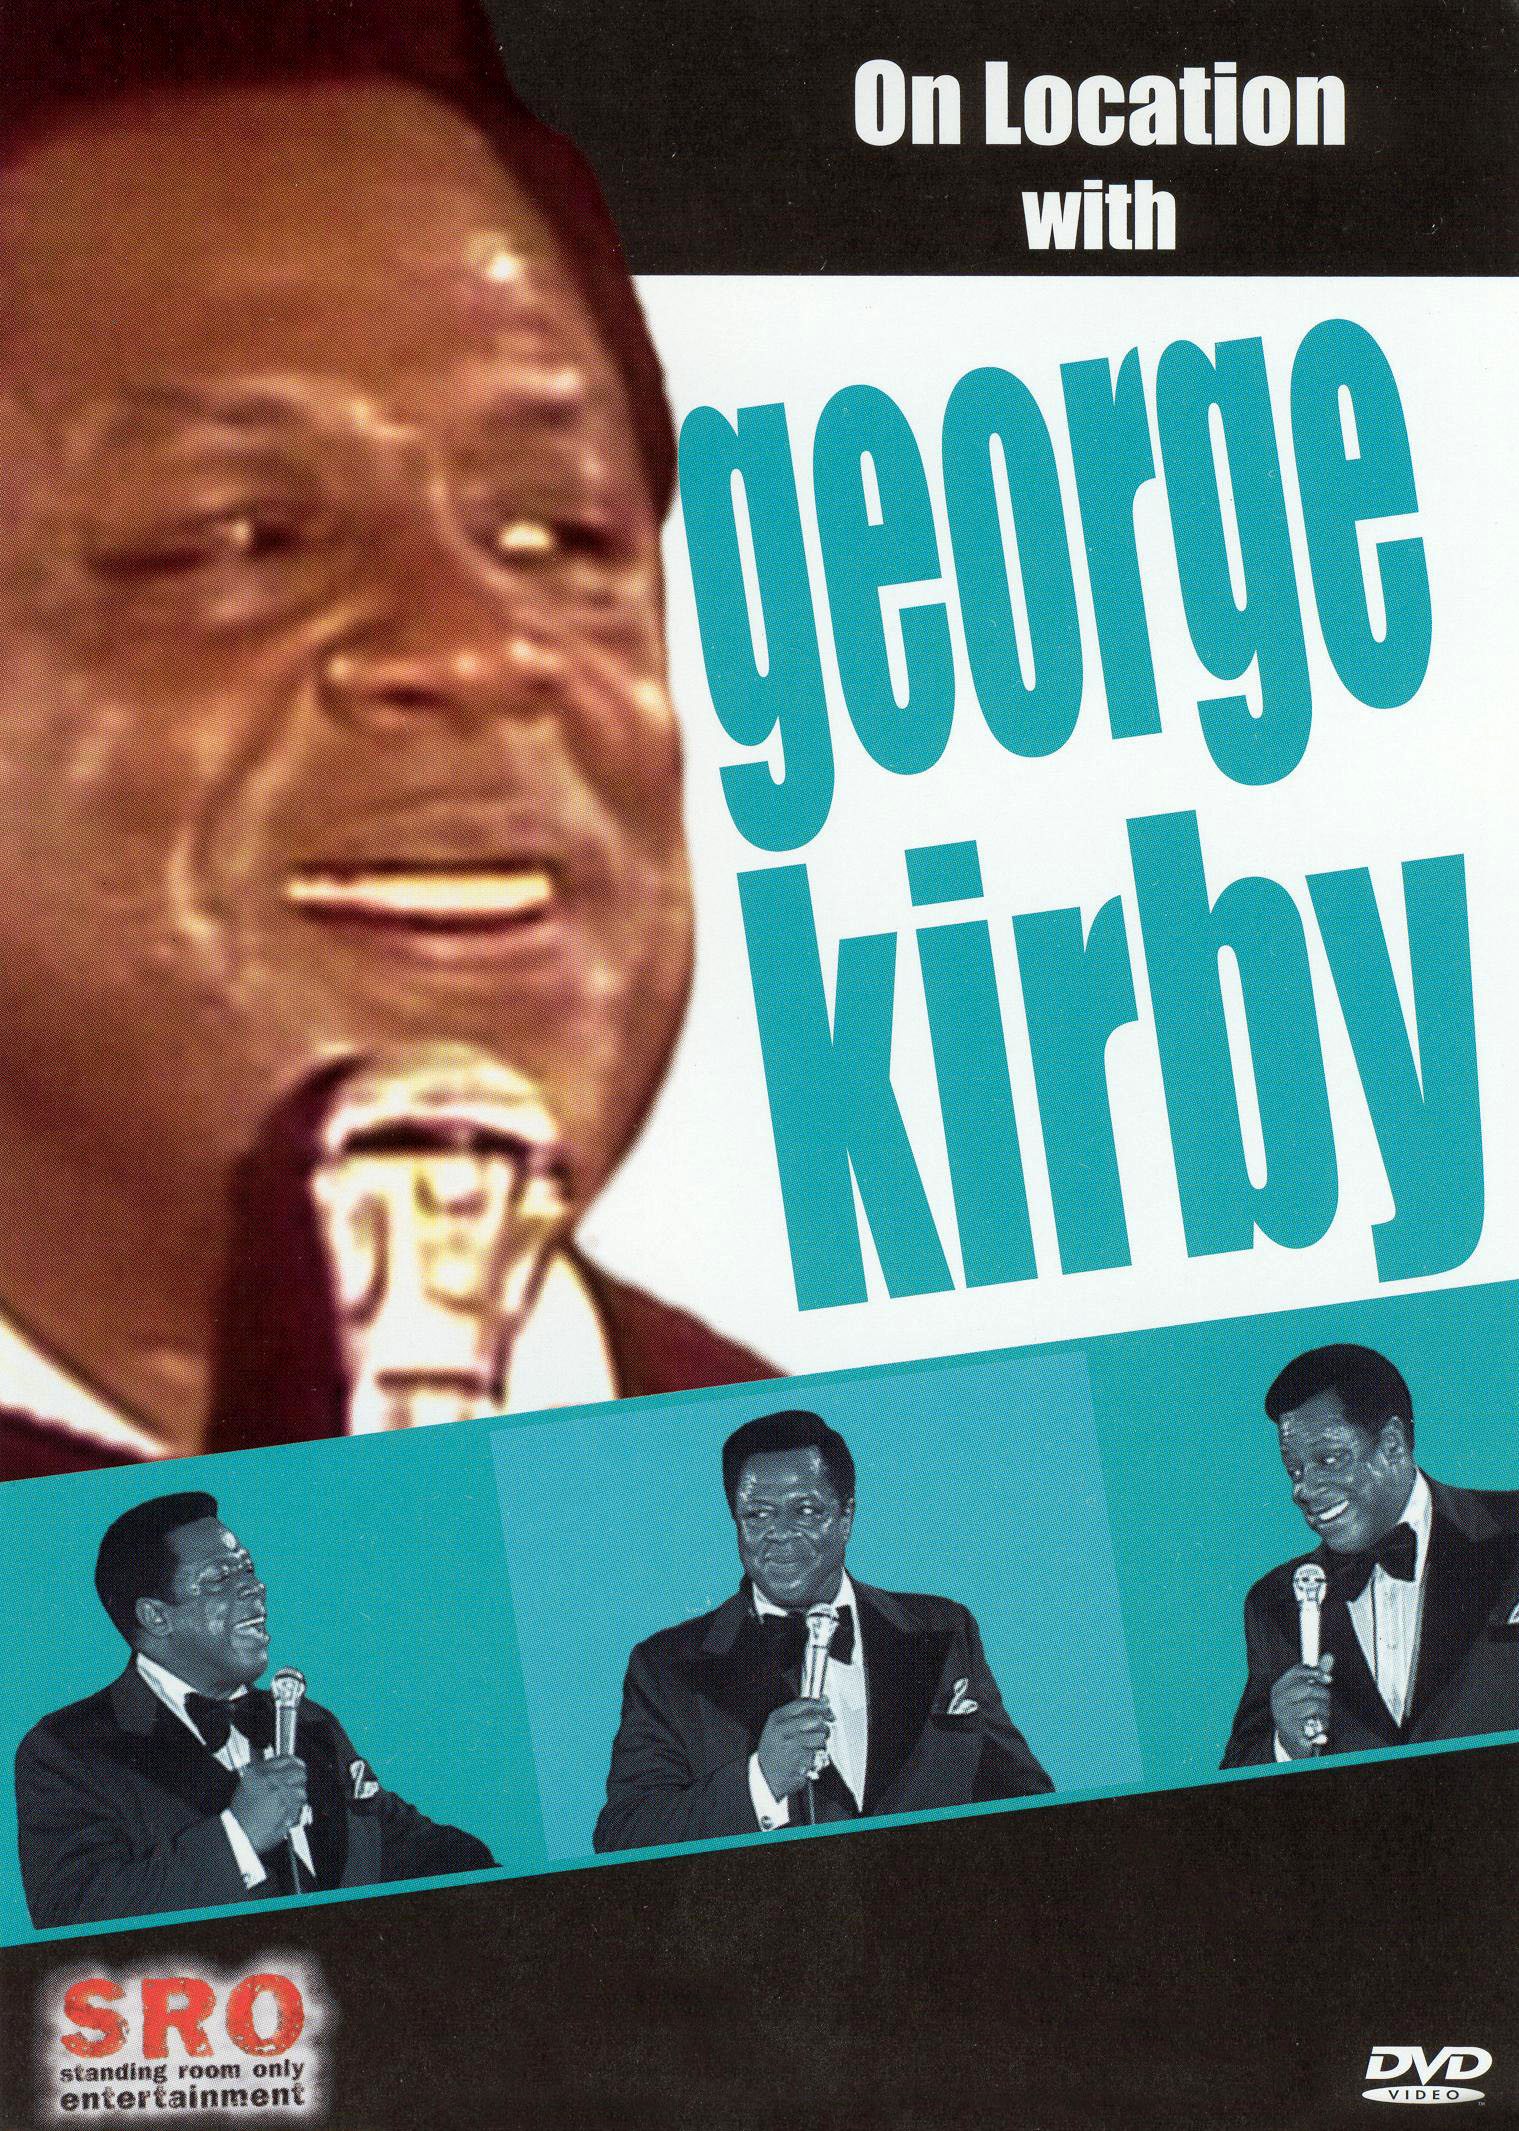 George Kirby: HBO Comedy Presents George Kirby